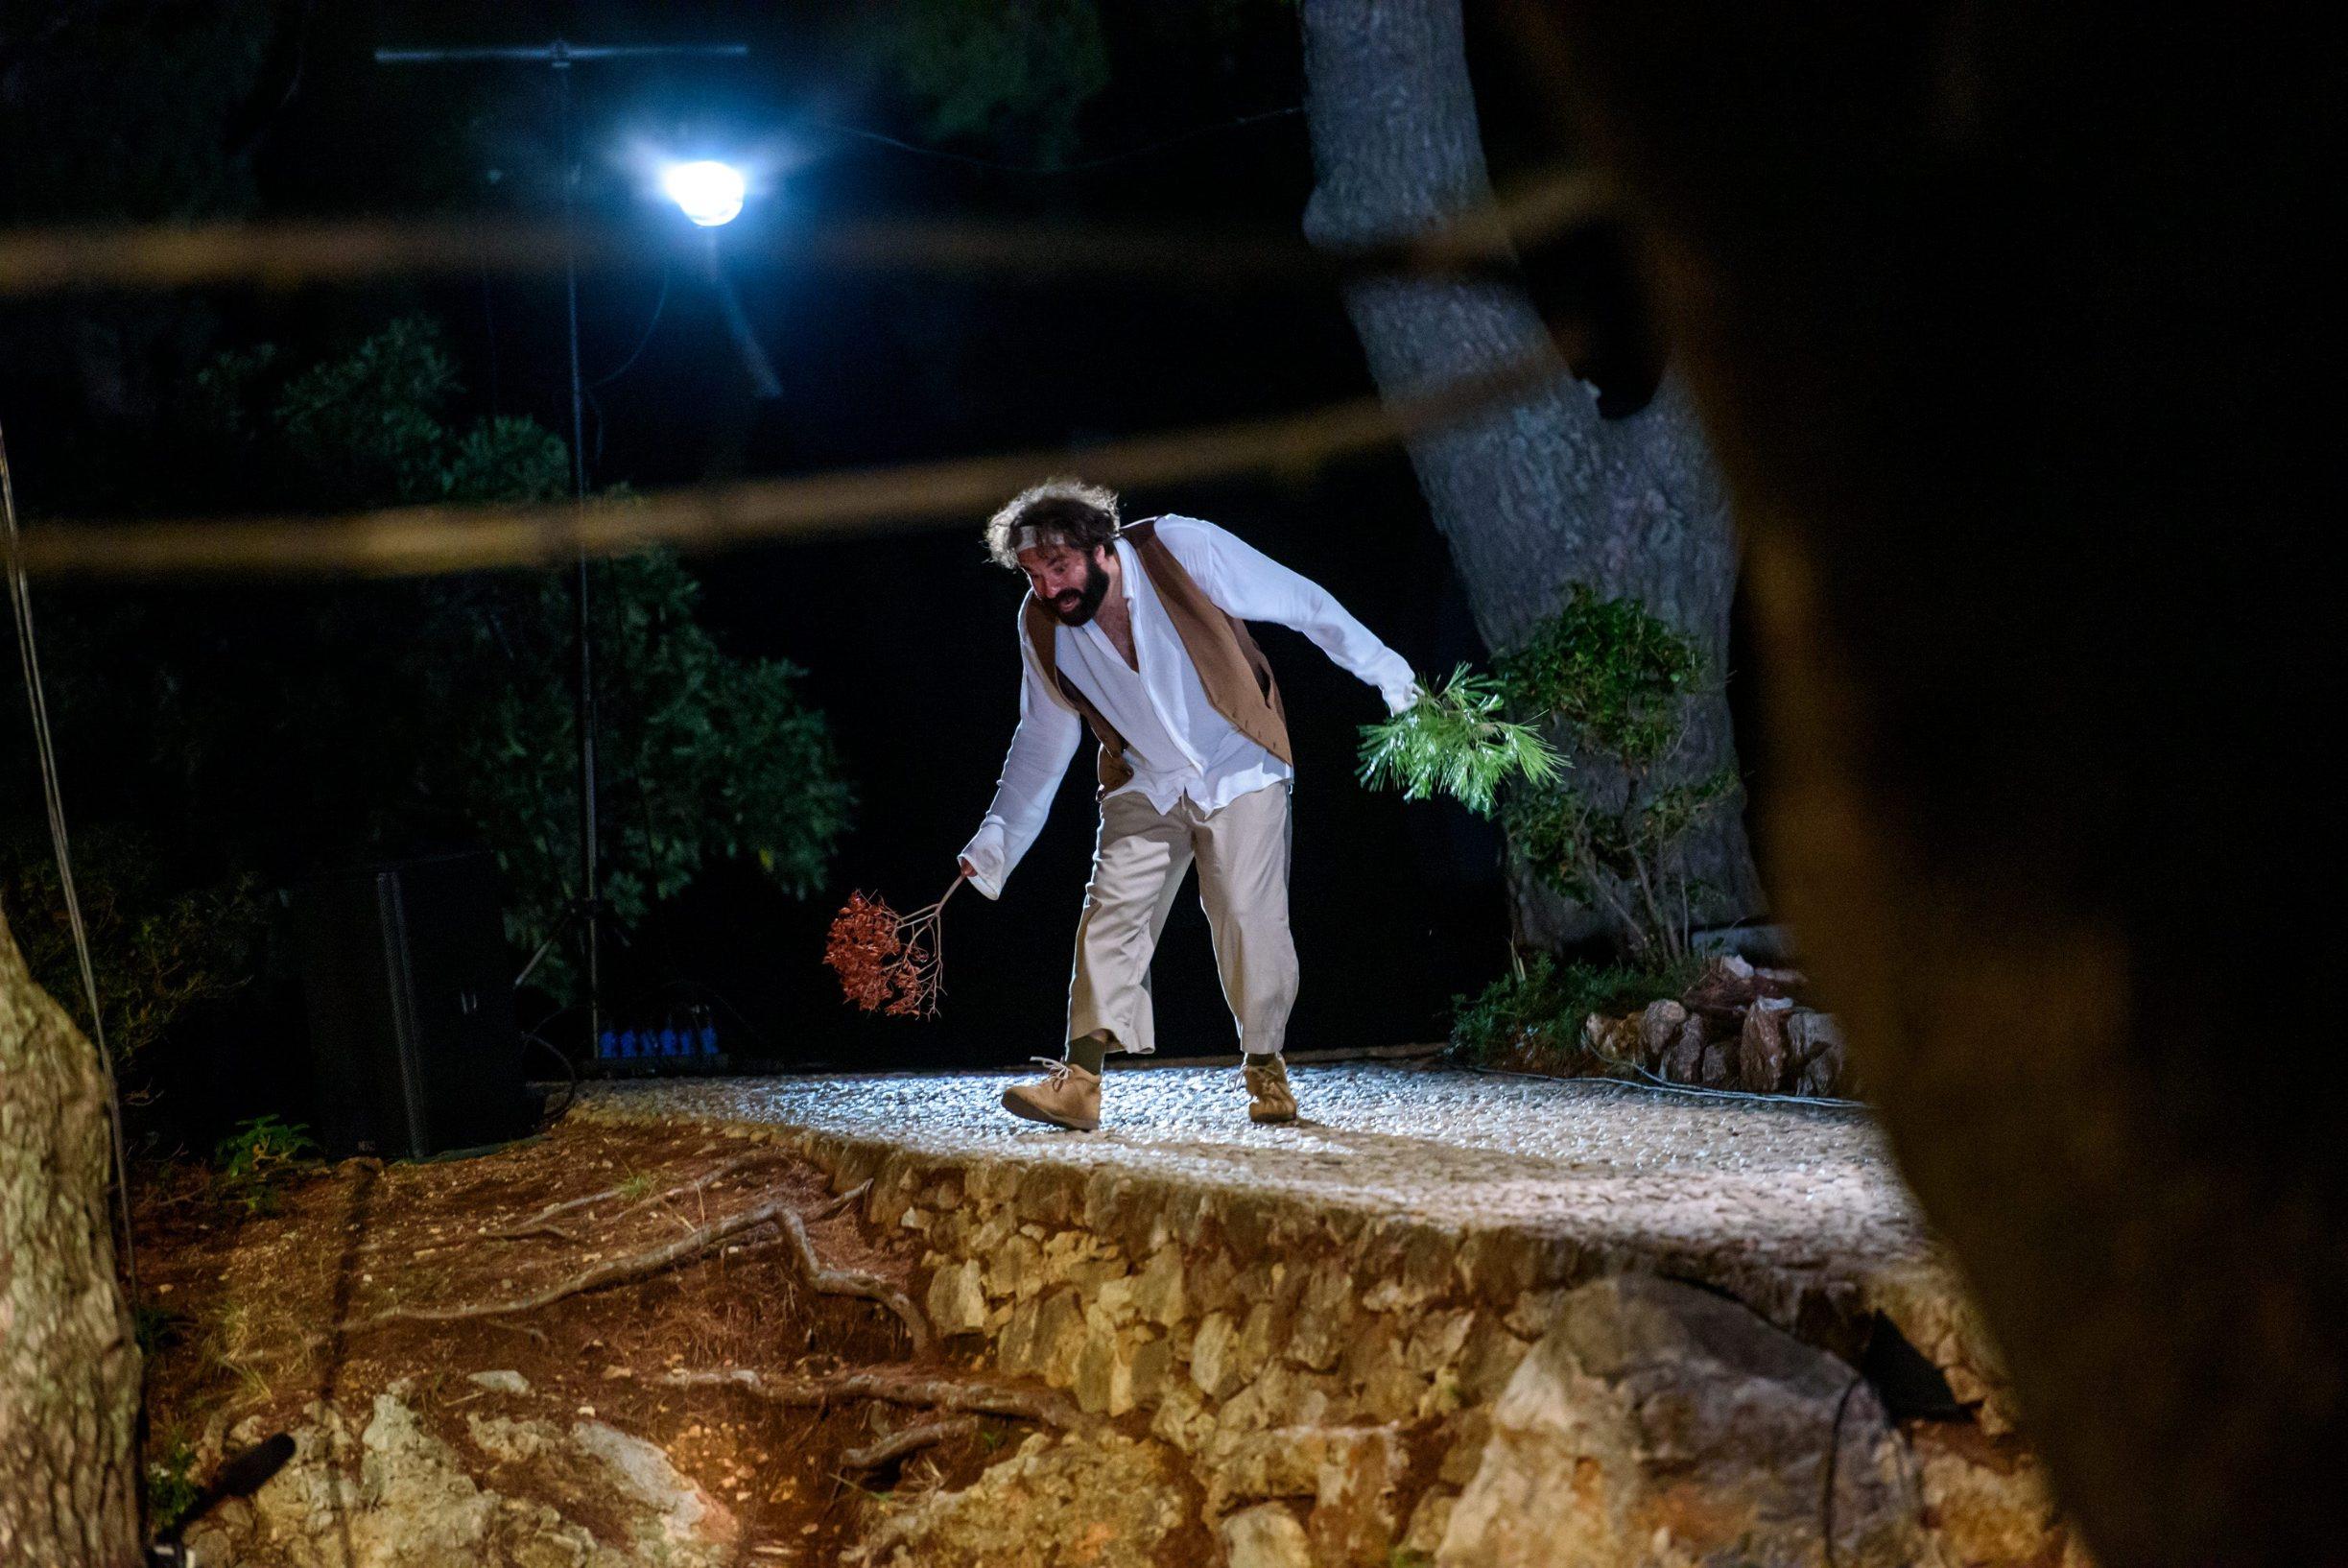 Dubrovnik, 20.08.2020. Premijera Drziceve Grizule u reziji Sase Bozica i Petre Hrascanec u parku Gradac. Foto: Tonci Plazibat / CROPIX